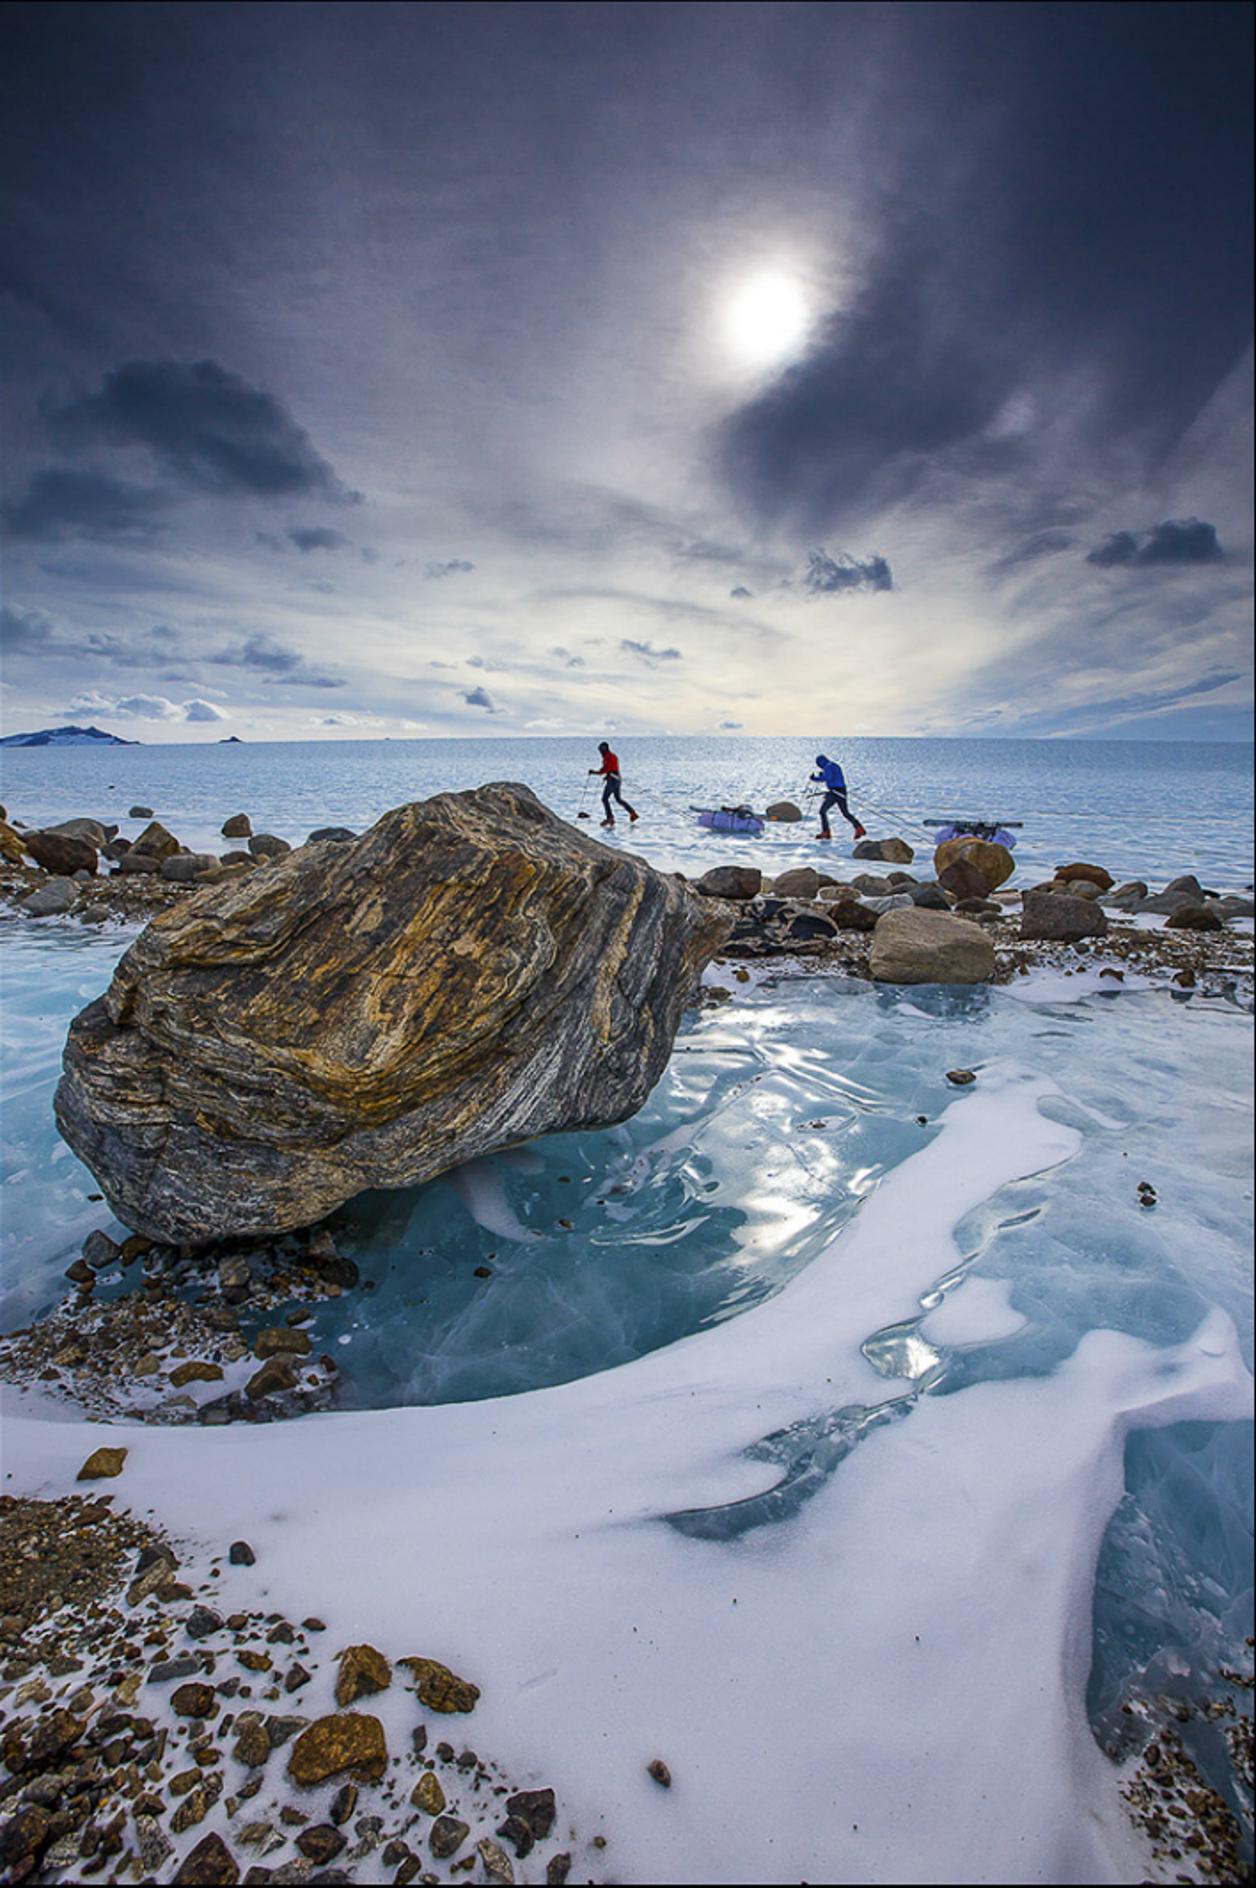 Cory-Richards-Photographer-Antarctica-3.jpg